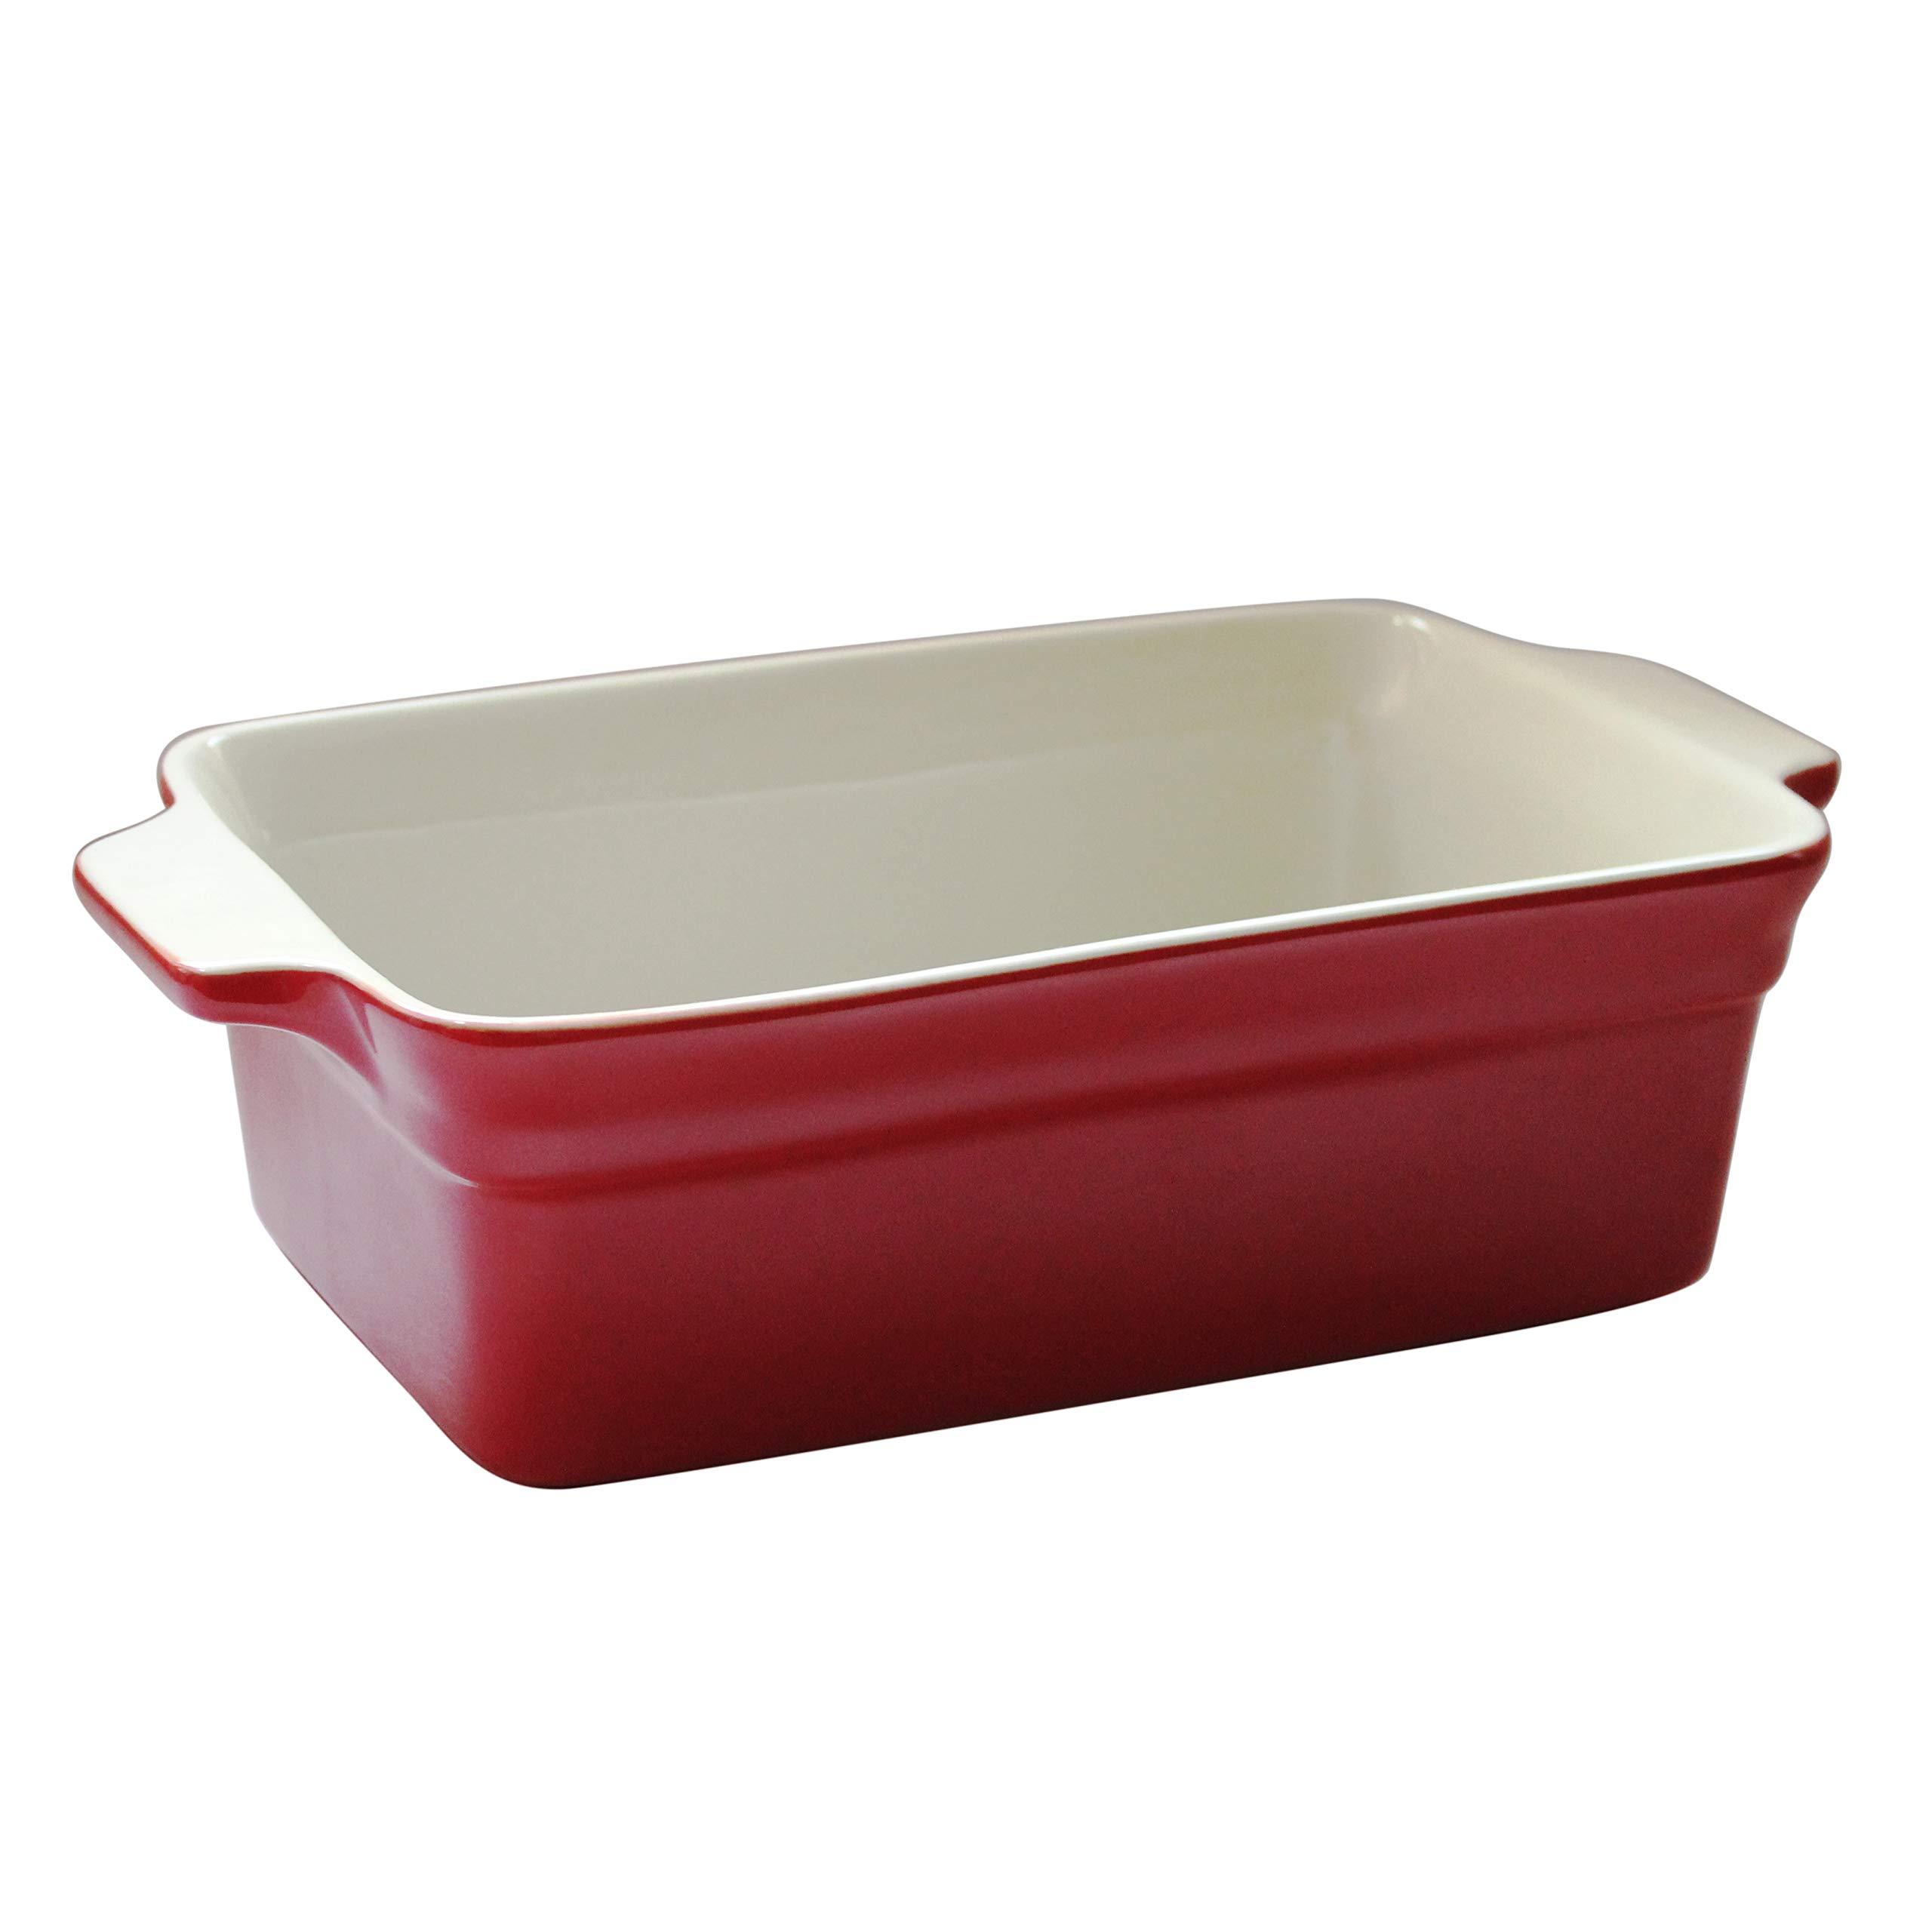 Lonovel Rectangular Baking Dish Roasting Lasagna Pan,11.5-Inch Classic Stoneware Ceramic Large Rectangular Bakers,Red